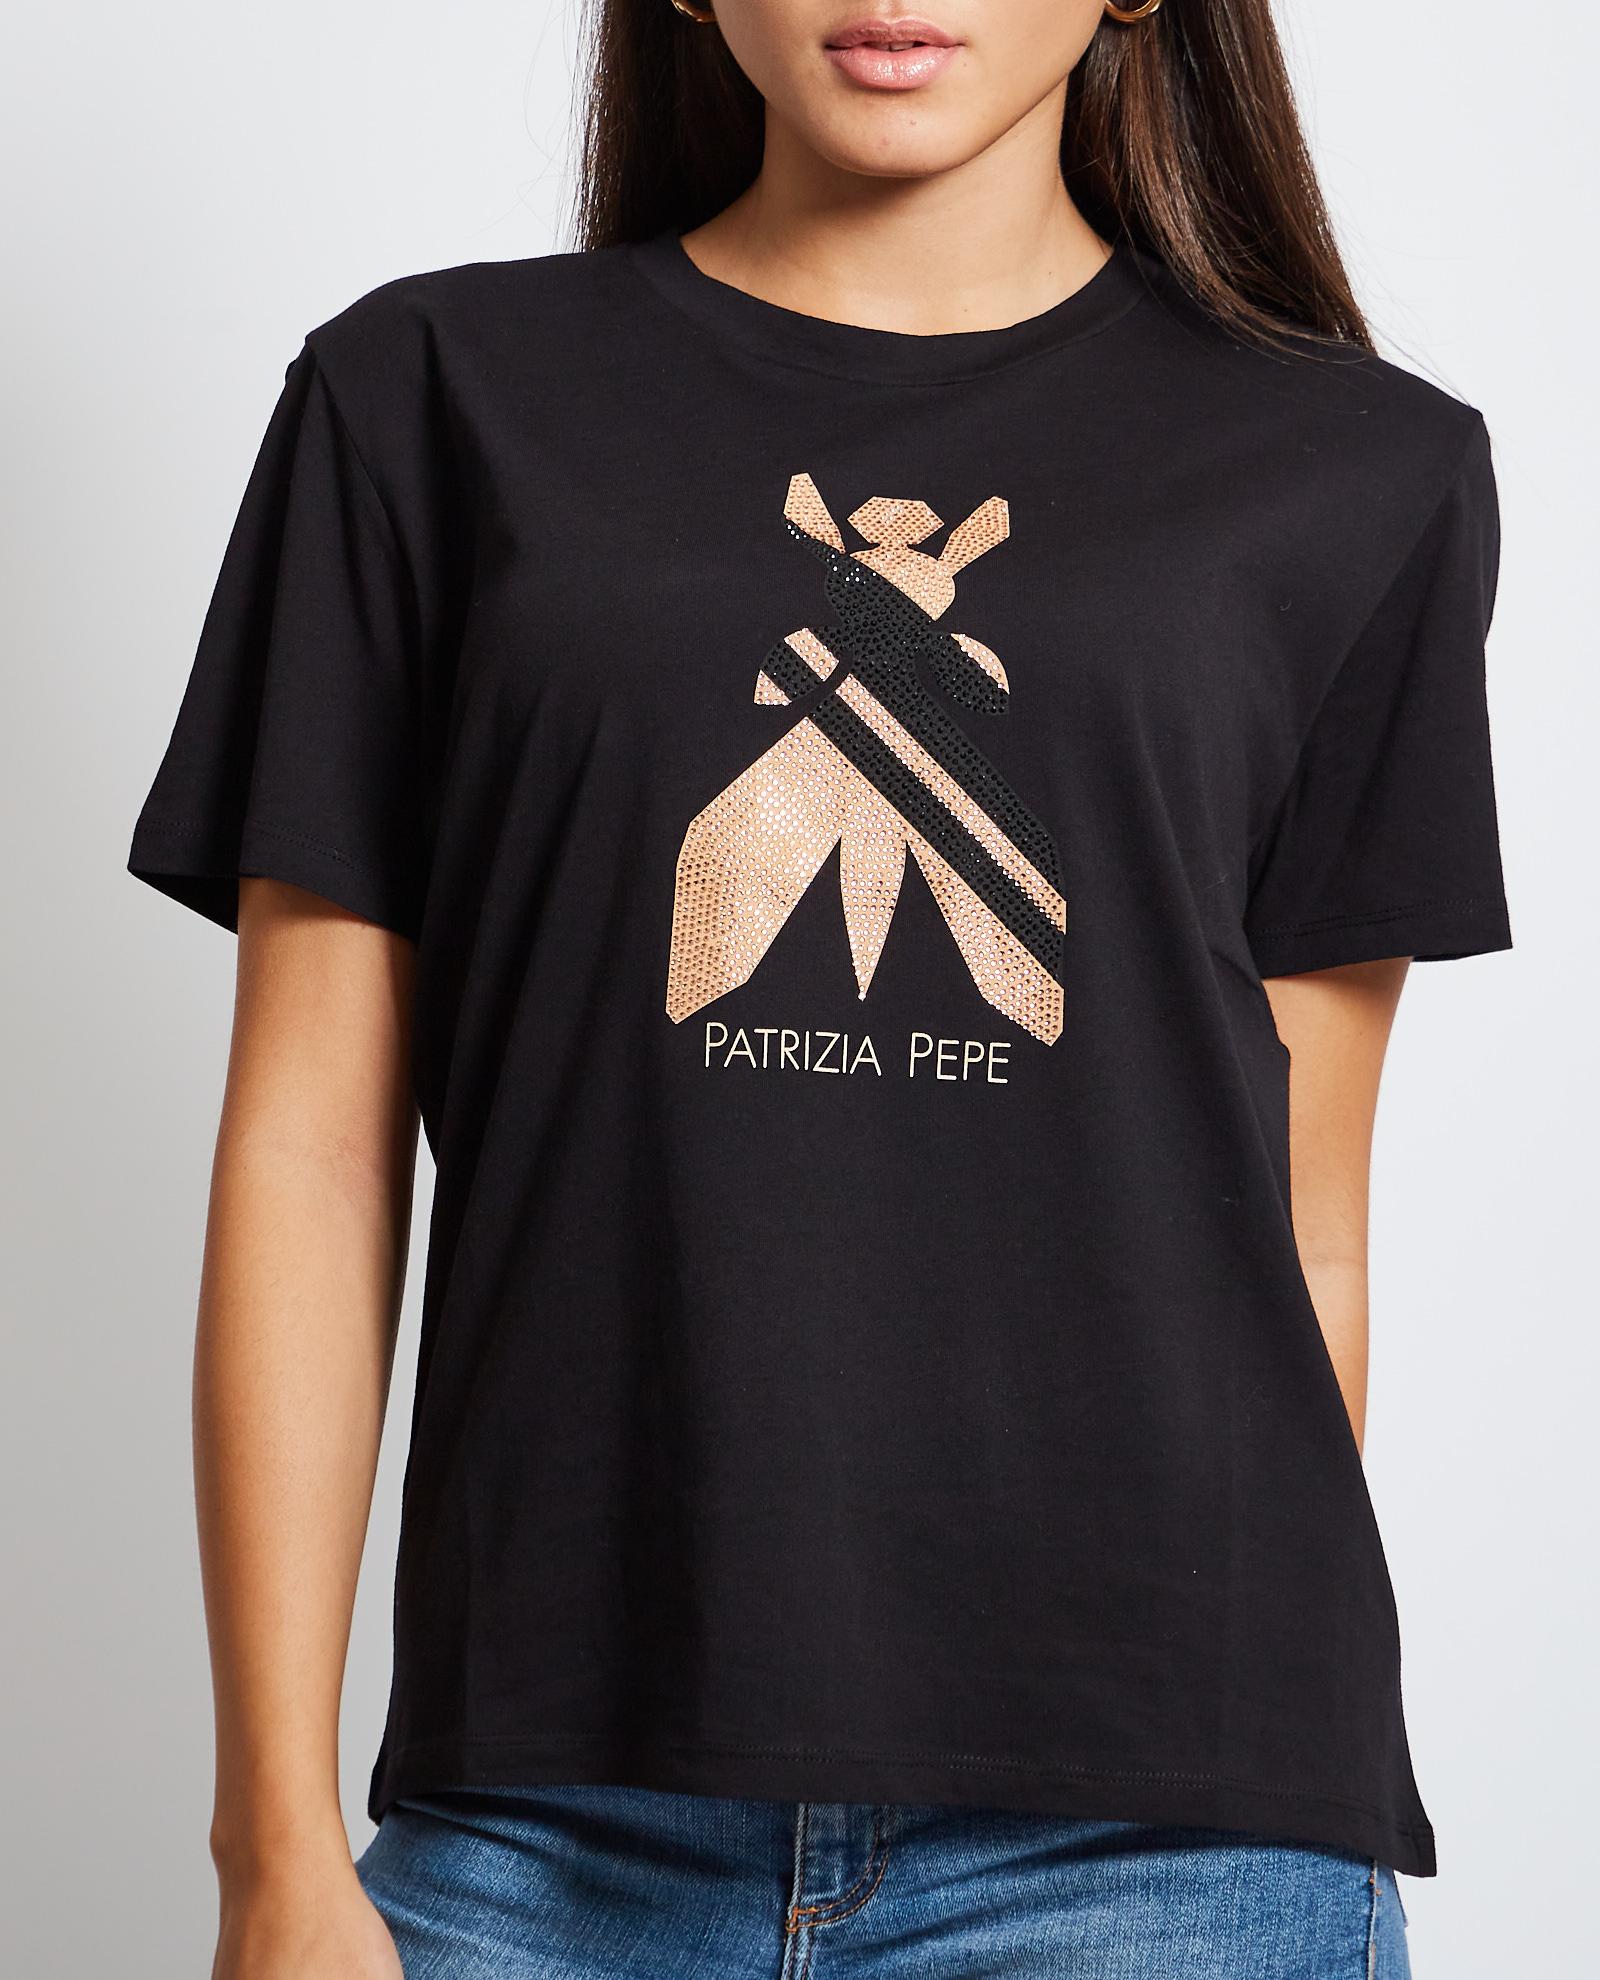 T-shirt  Patrizia Pepe PATRIZIA PEPE | T-shirt | 8M1350-A8T0K103